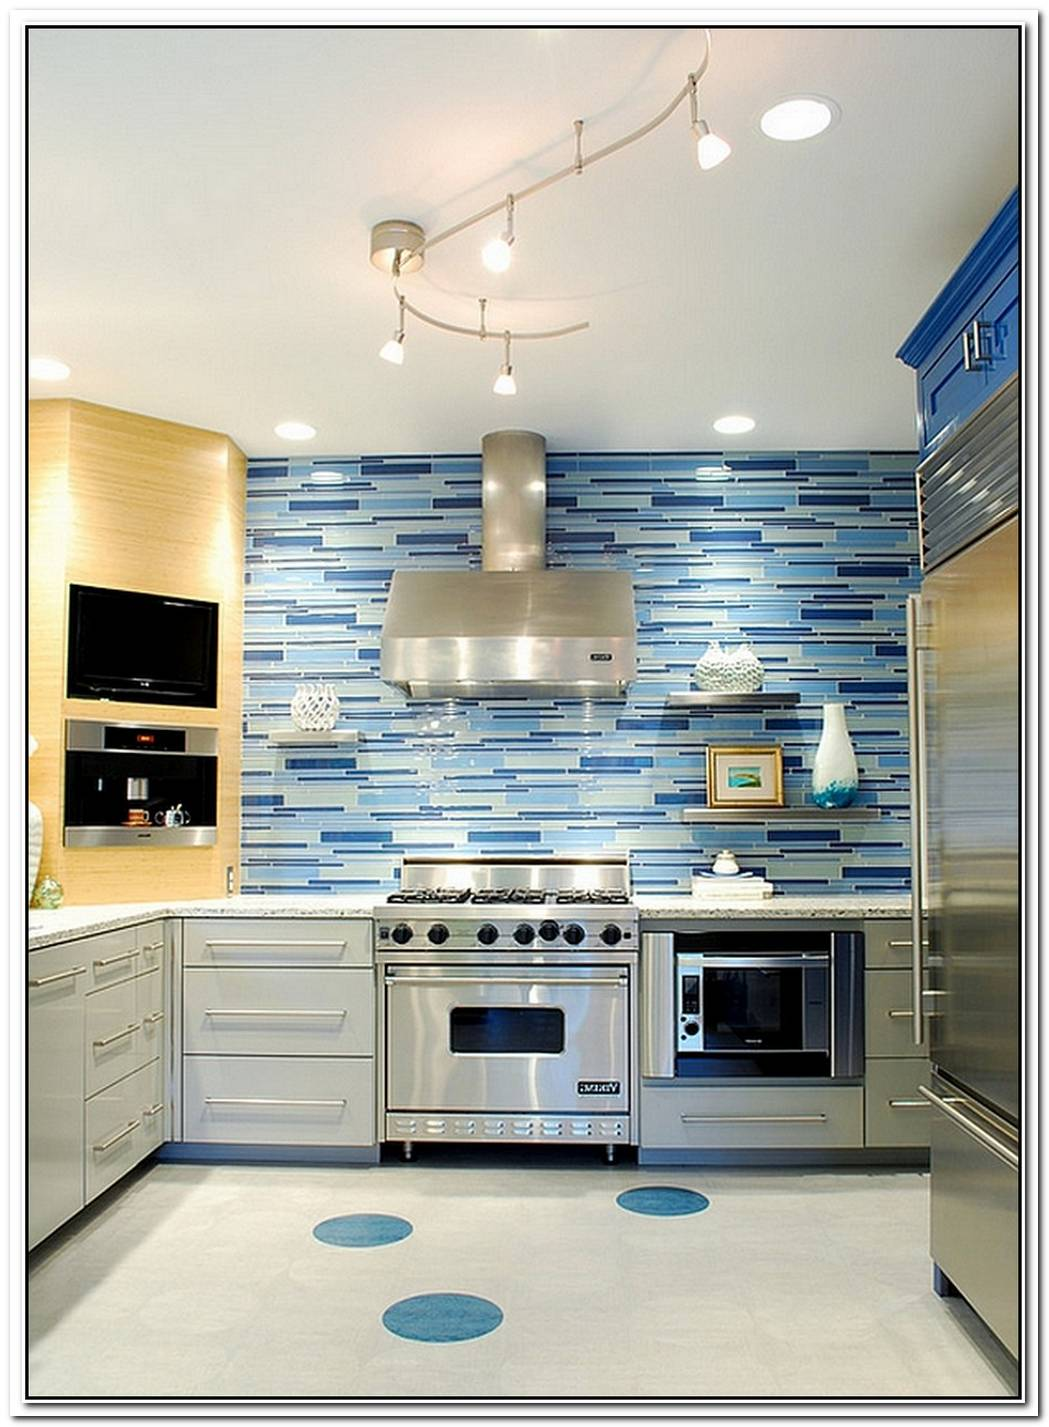 Kitchen Backsplash IdeasA Splattering Of The Most Popular Colors